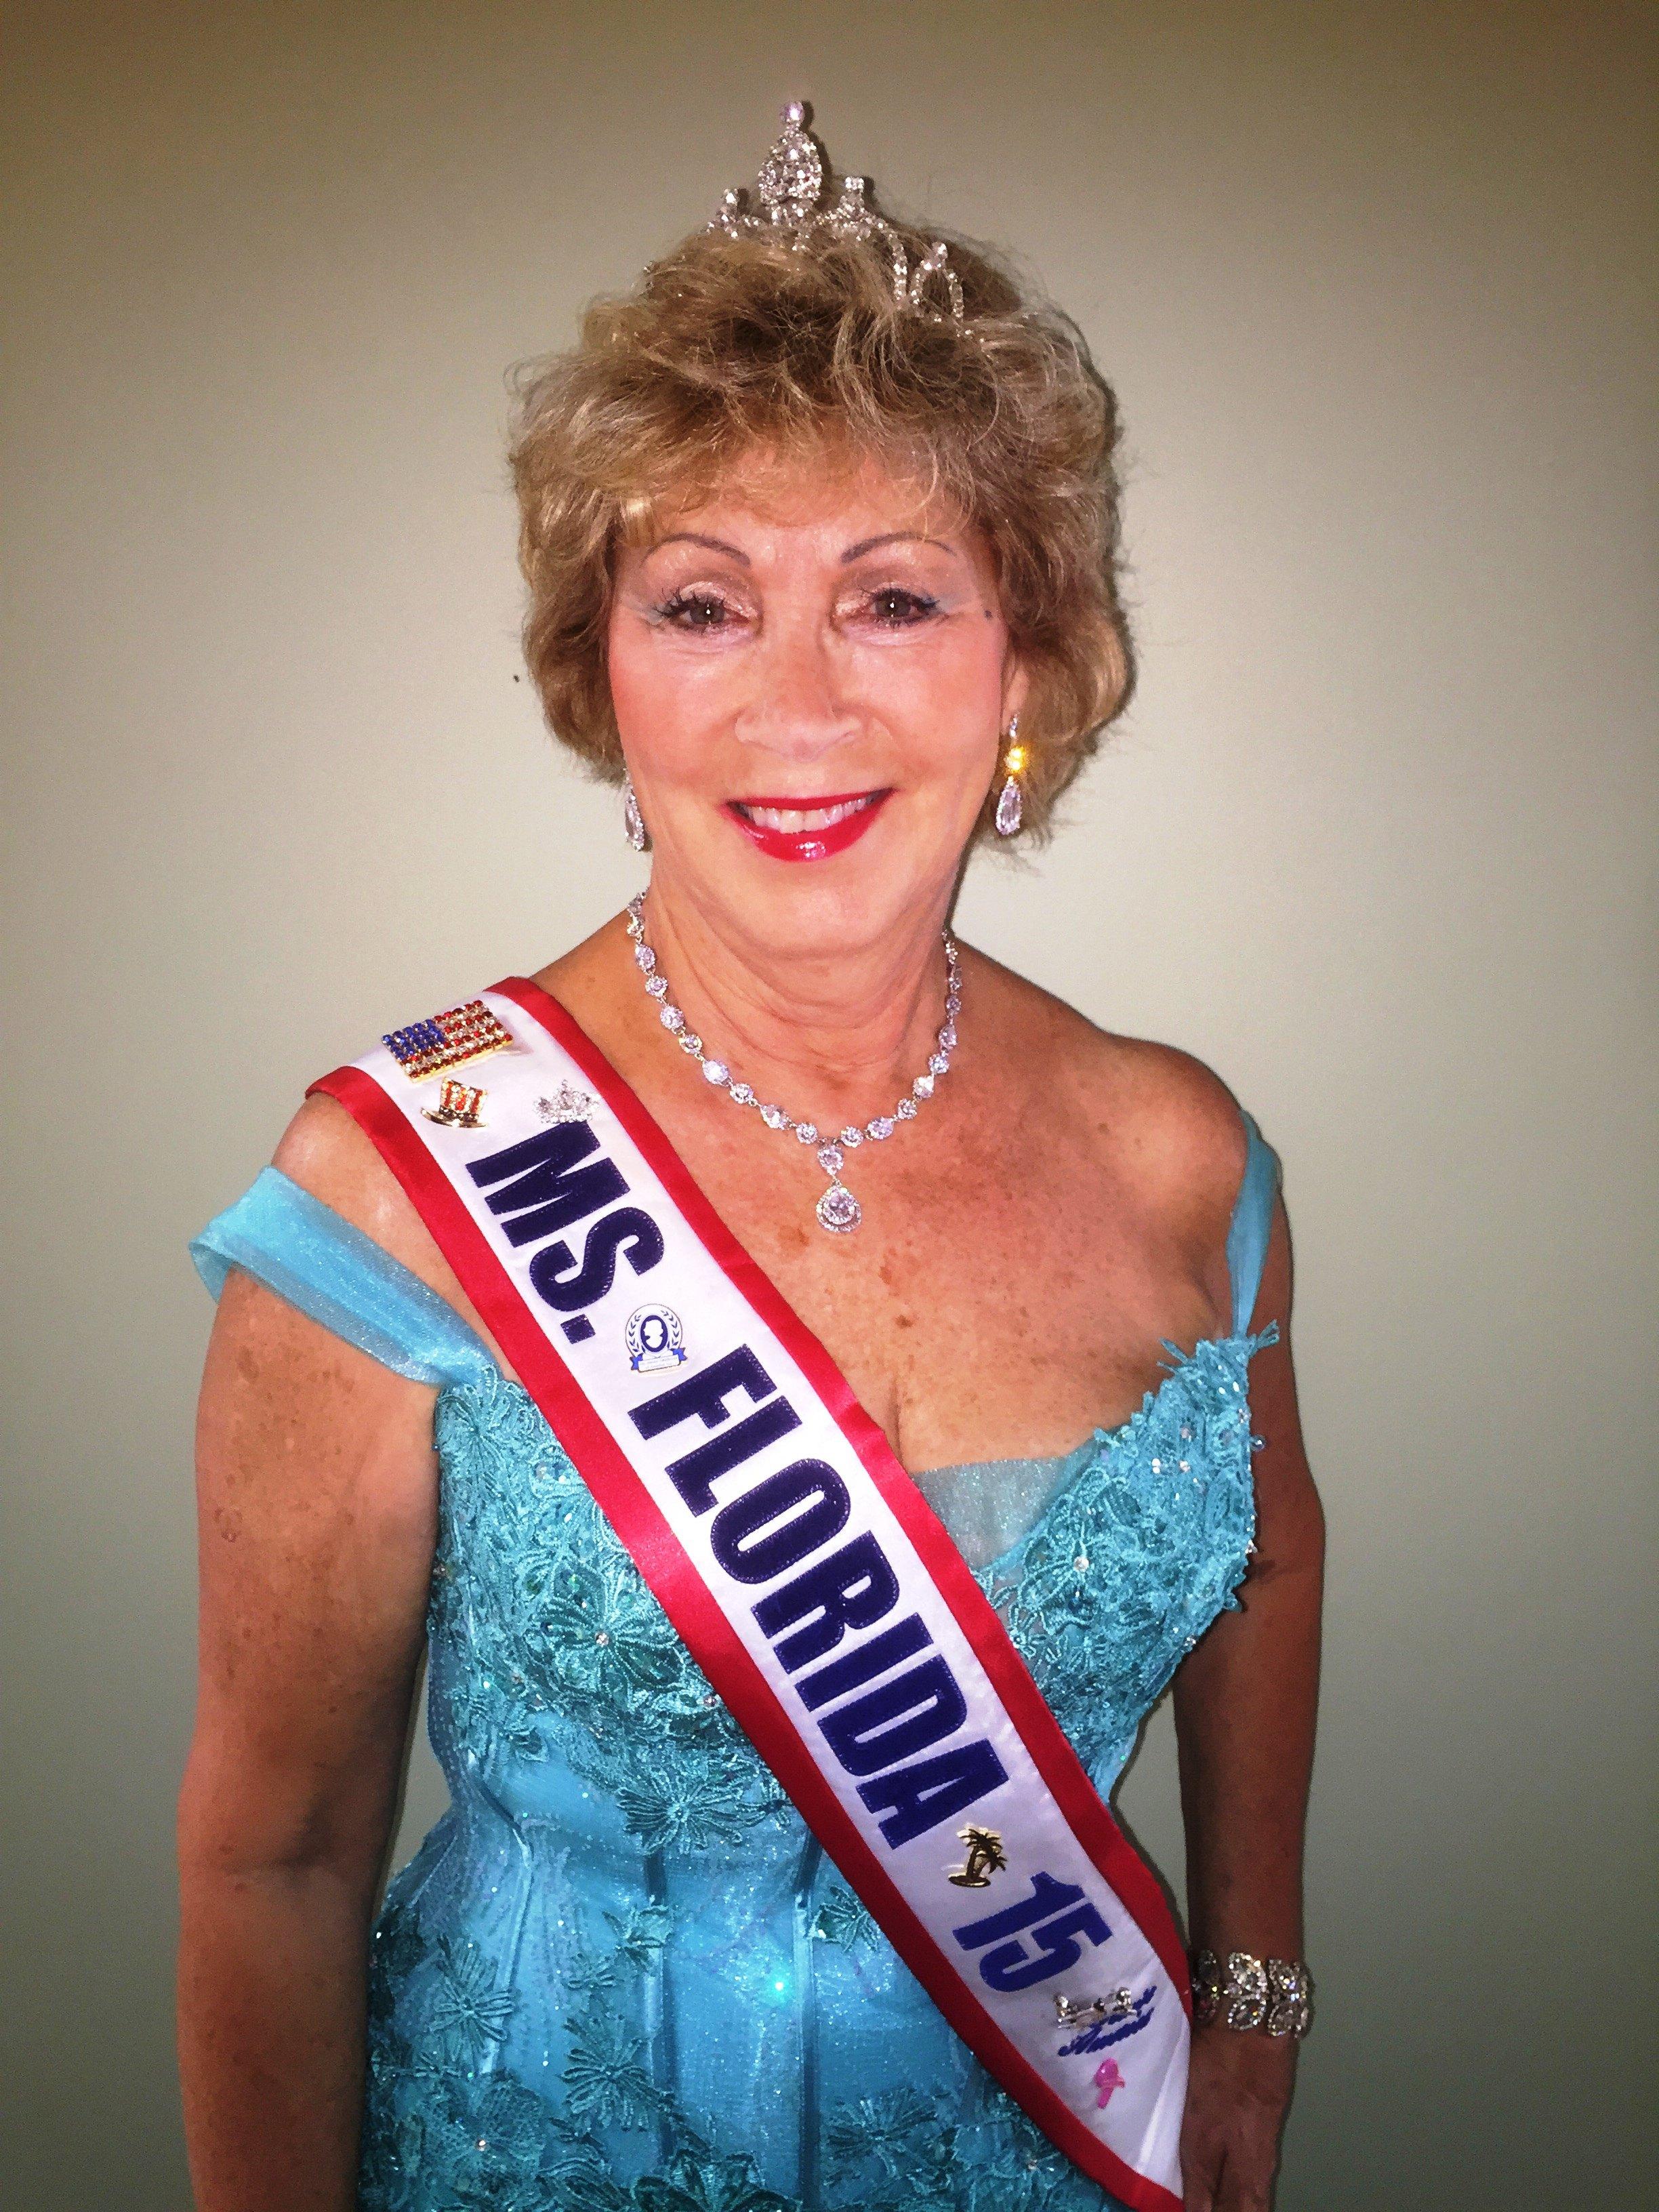 Ms. Senior Florida pageant winner 2015